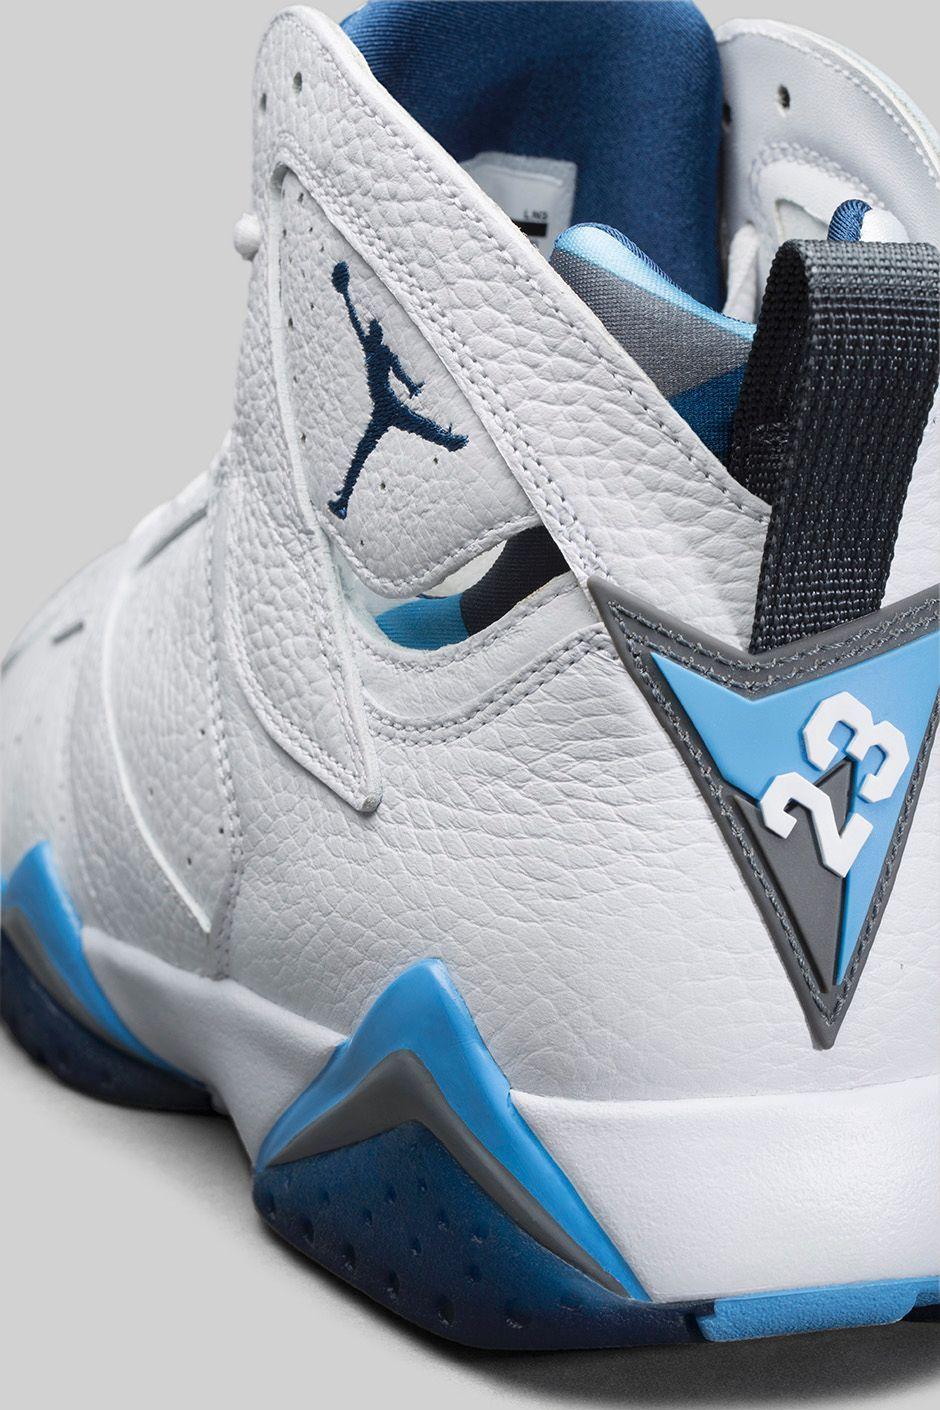 Air Jordan 7 (VII) Retro Blanc/Gris magasin